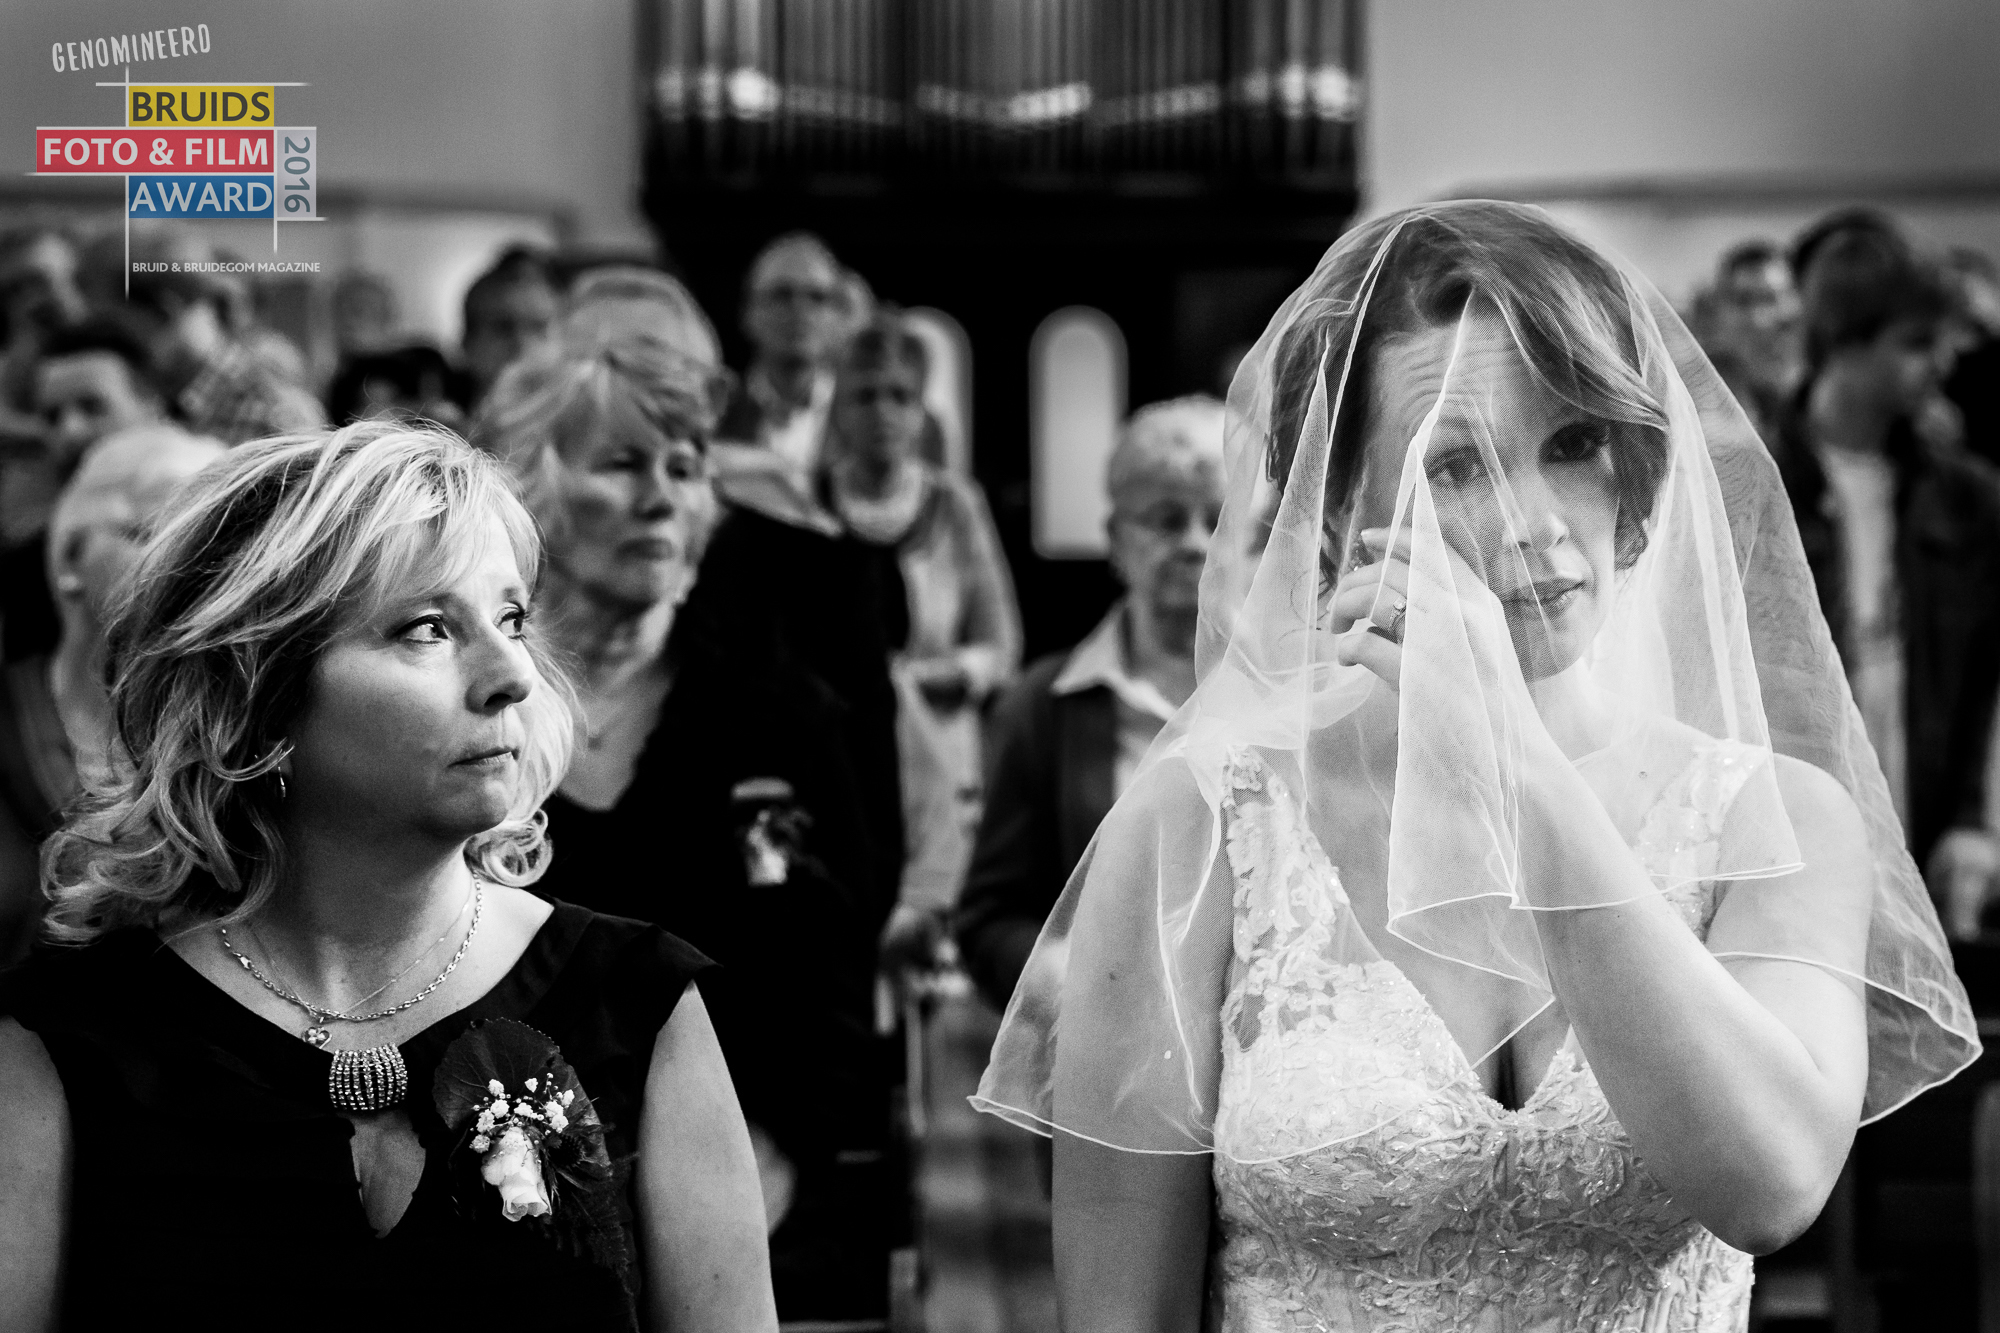 BFA - De ceremonie - Marieke Zwartscholten fotografie - 2